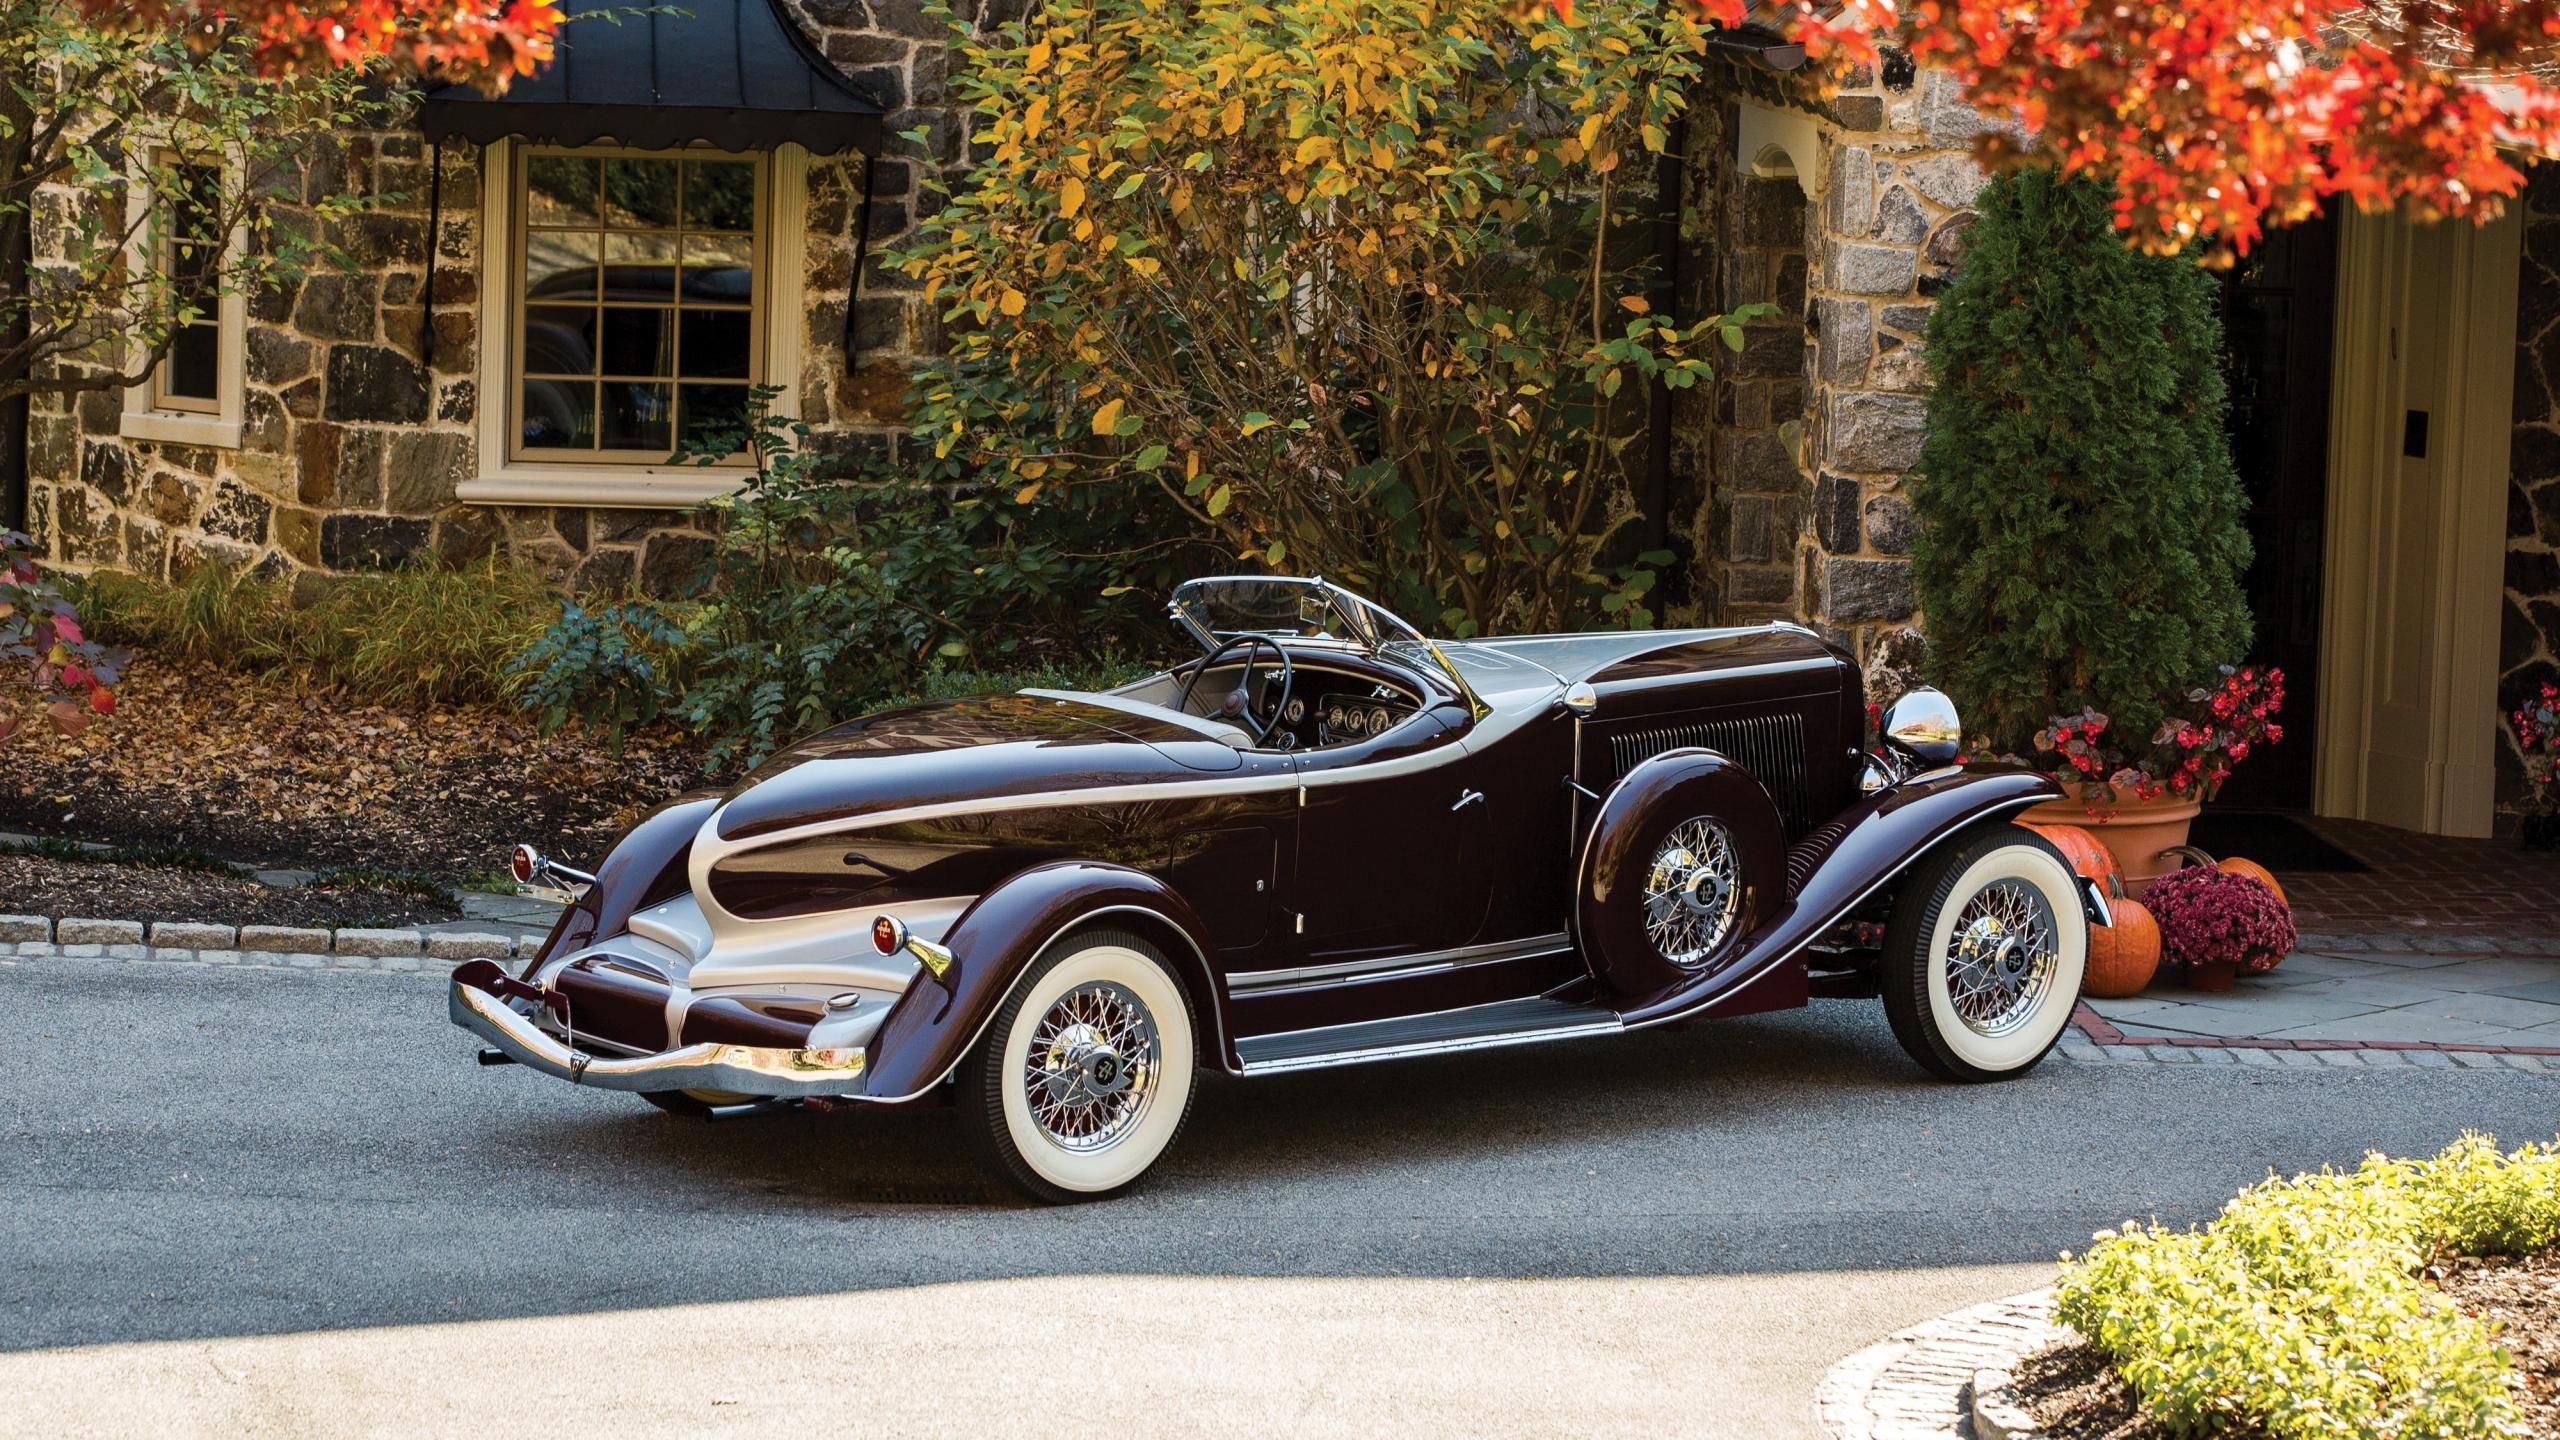 Download 2560x1440 Wallpaper Classic Car 1934 Auburn Twelve Salon Speedster Dual Wide Widescreen 16 9 Widescreen 2560x1440 Hd Image Background 9127